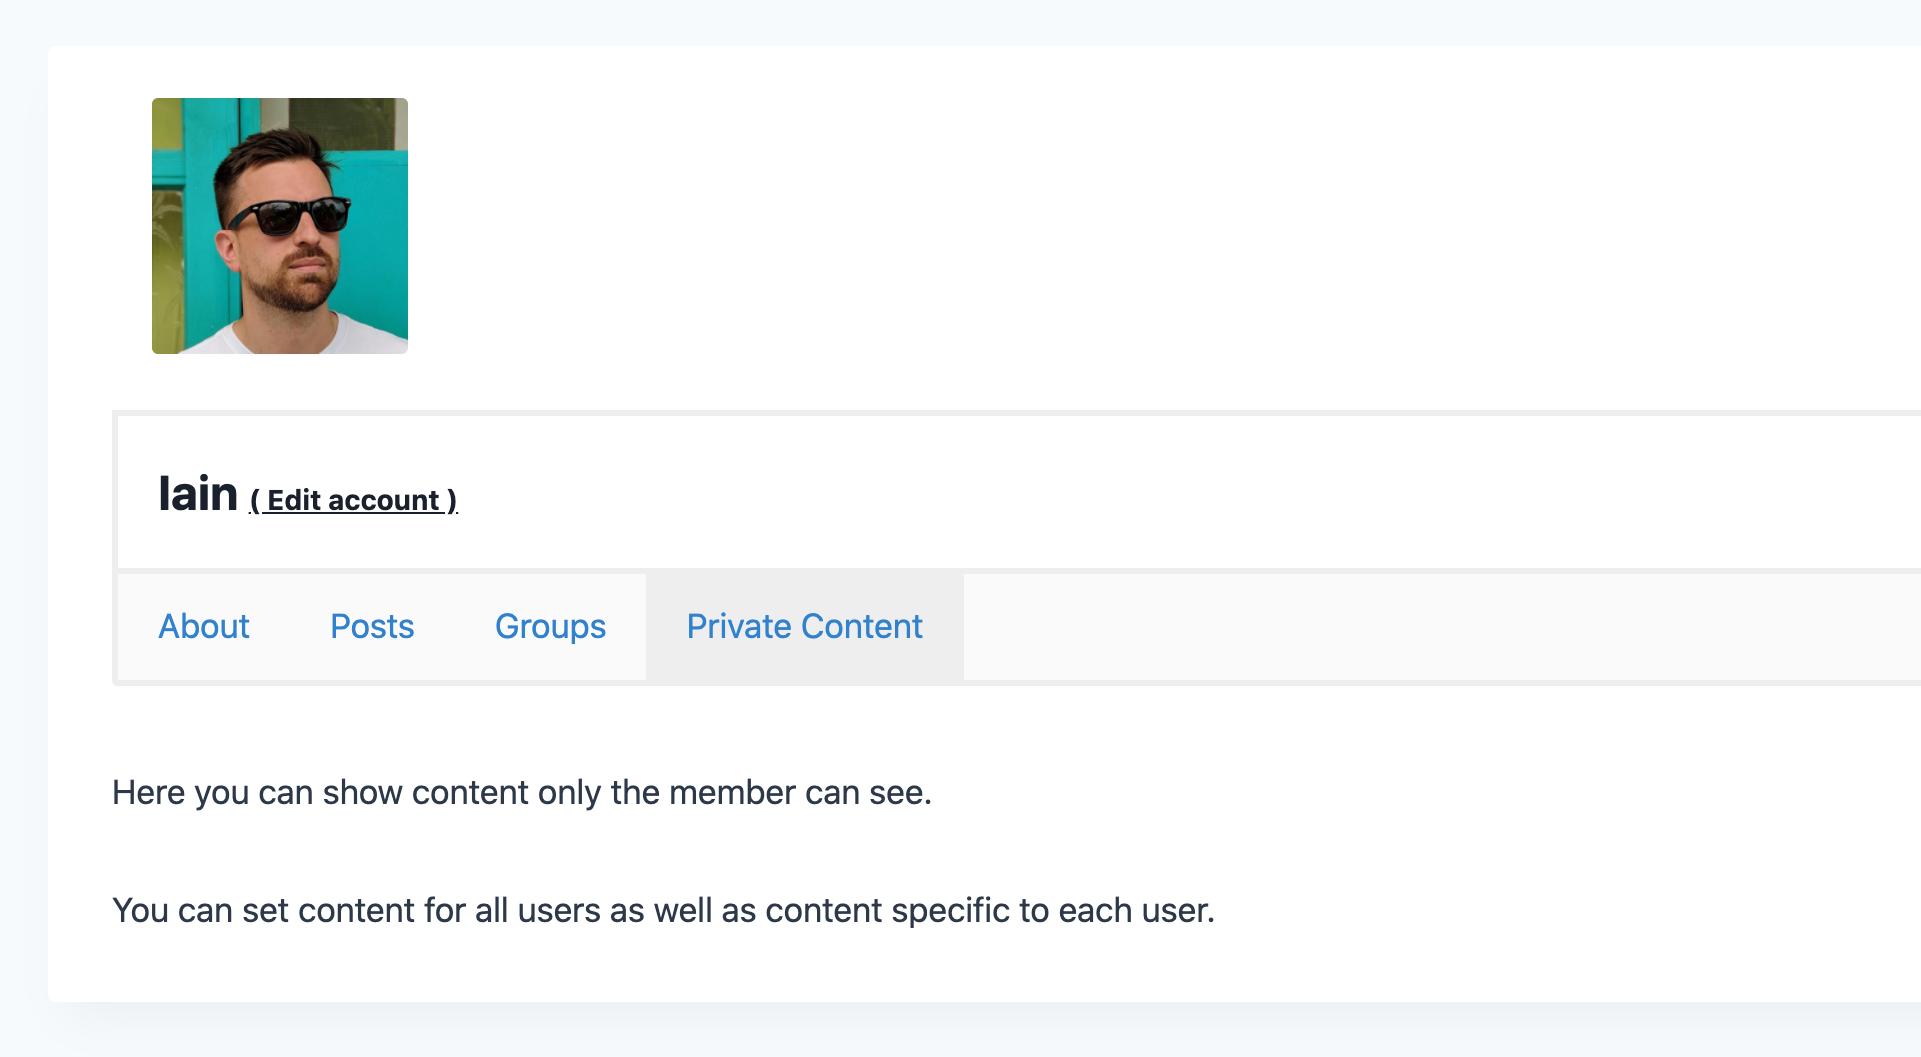 Private Content screenshot